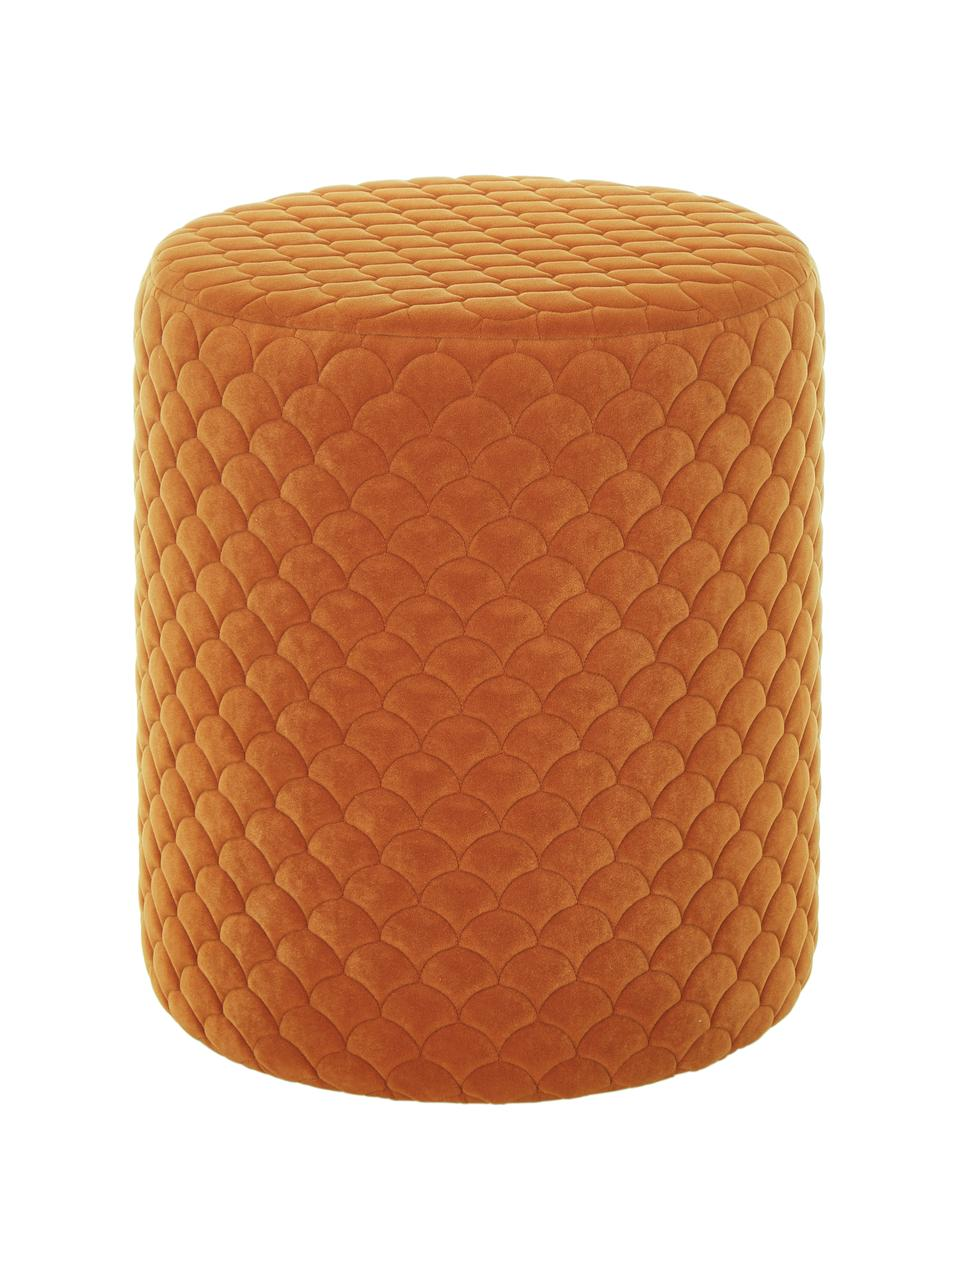 Samt-Hocker Daisy, Bezug: Samt (Polyester) 84.000 S, Rahmen: Sperrholz, Samt Terrakotta, Ø 38 x H 45 cm